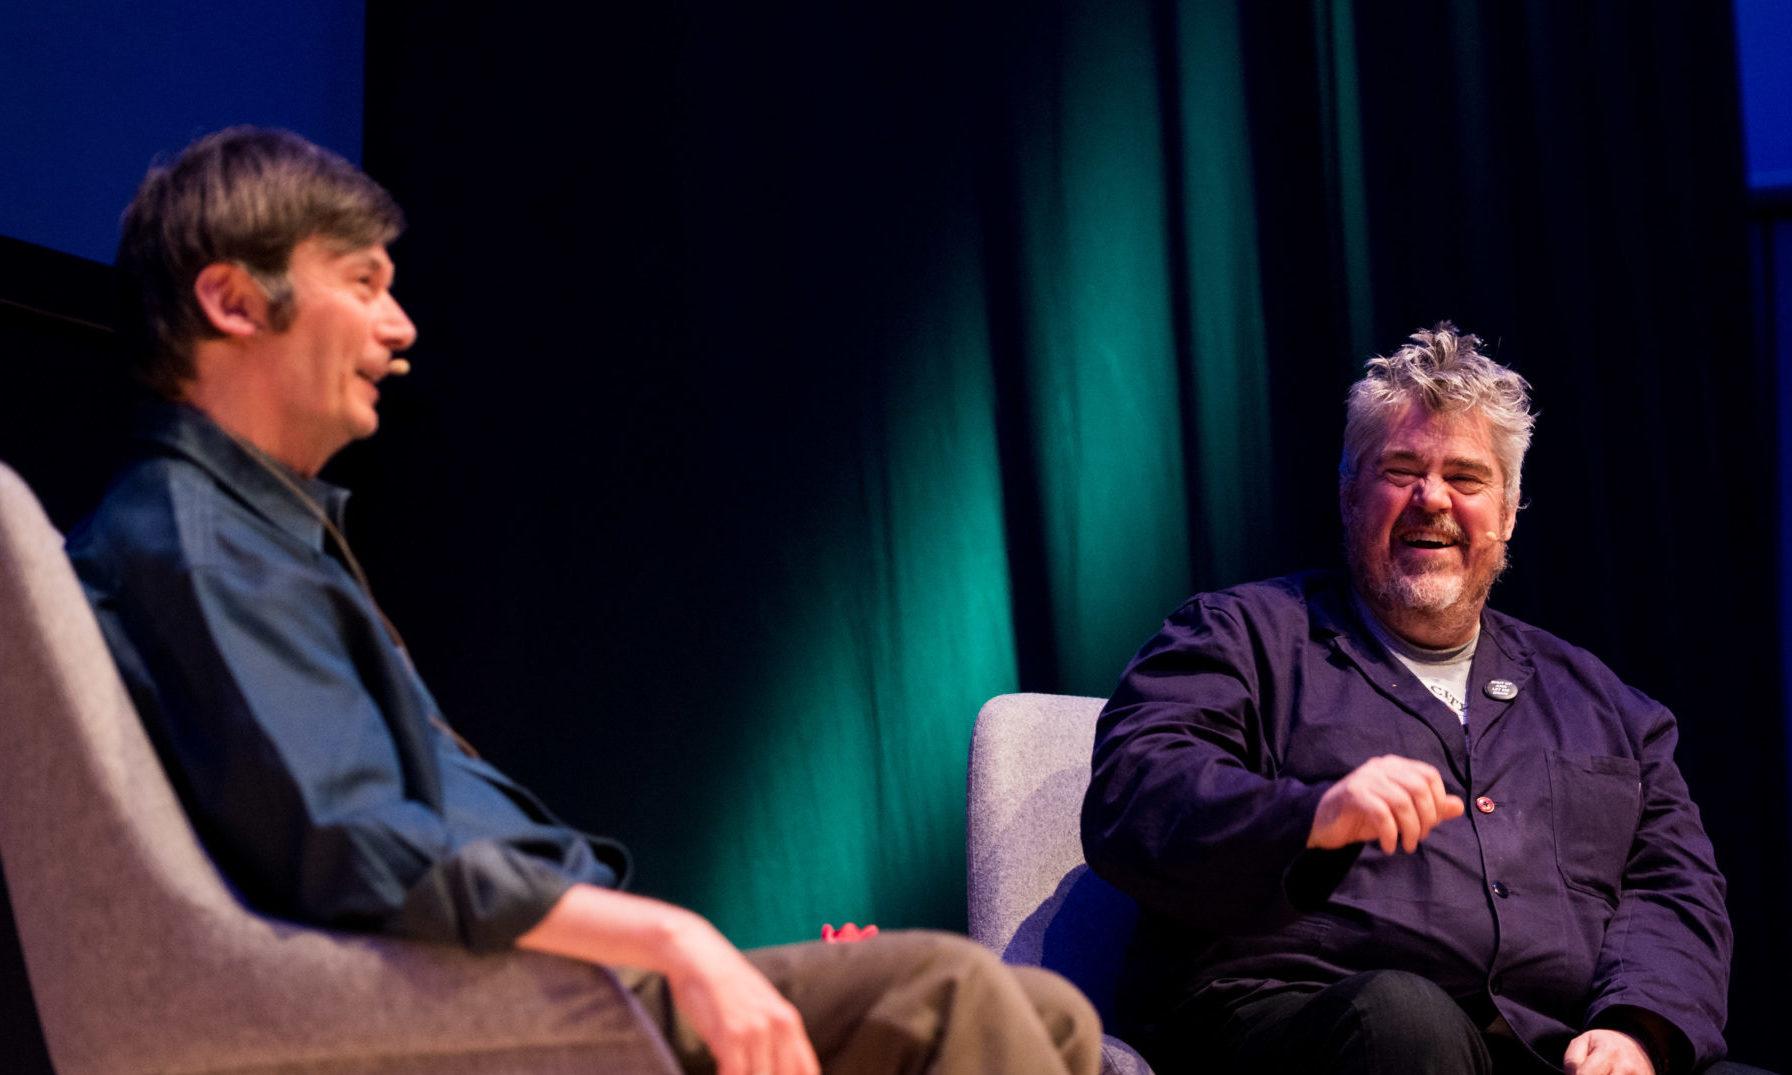 Ian Rankin and Phill Jupitus in conversation at Granite Noir last year.